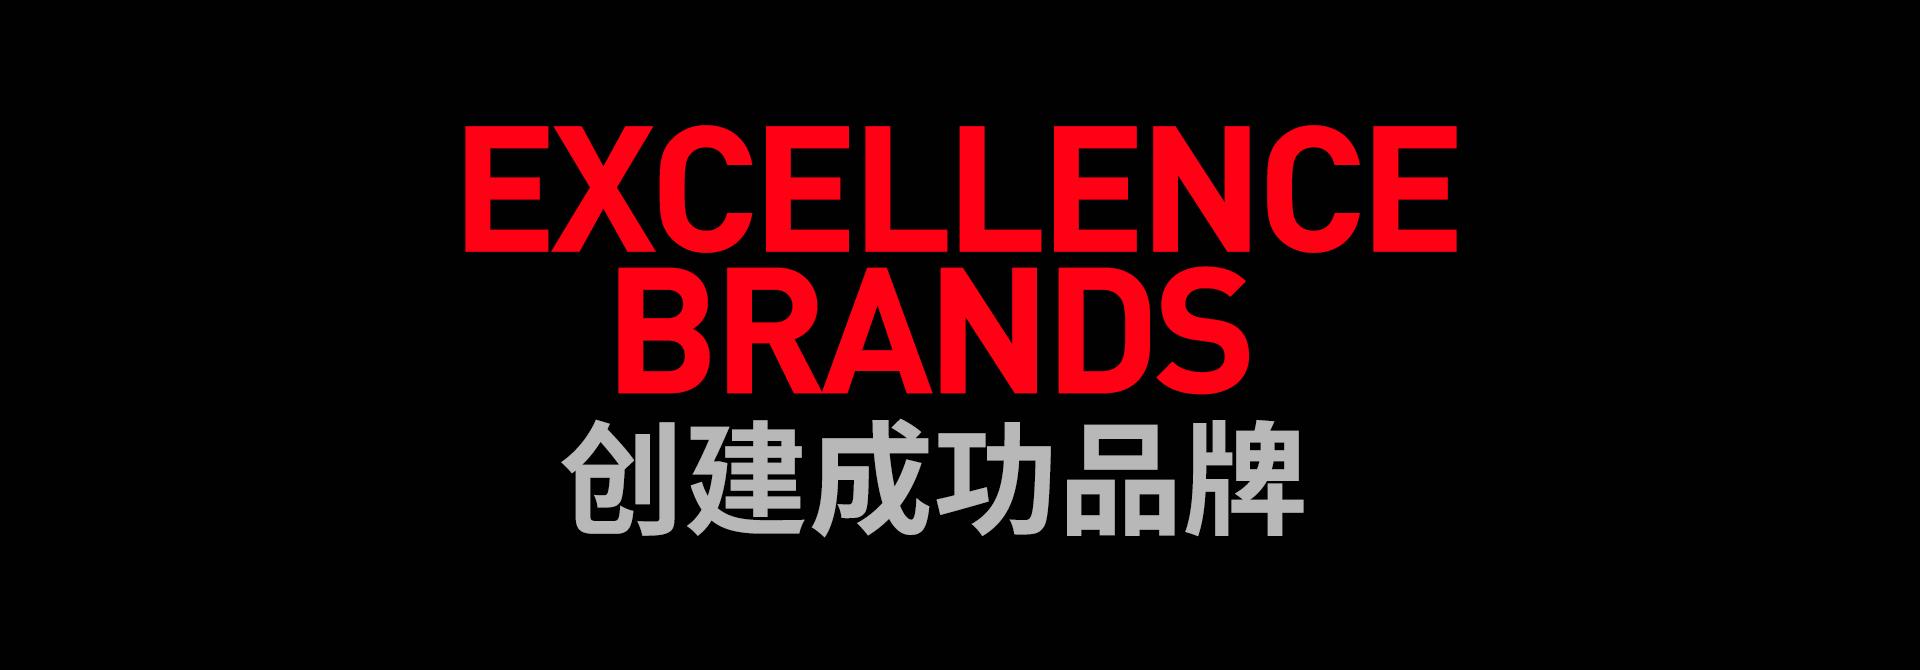 vi设计公司为企业创建成功品牌